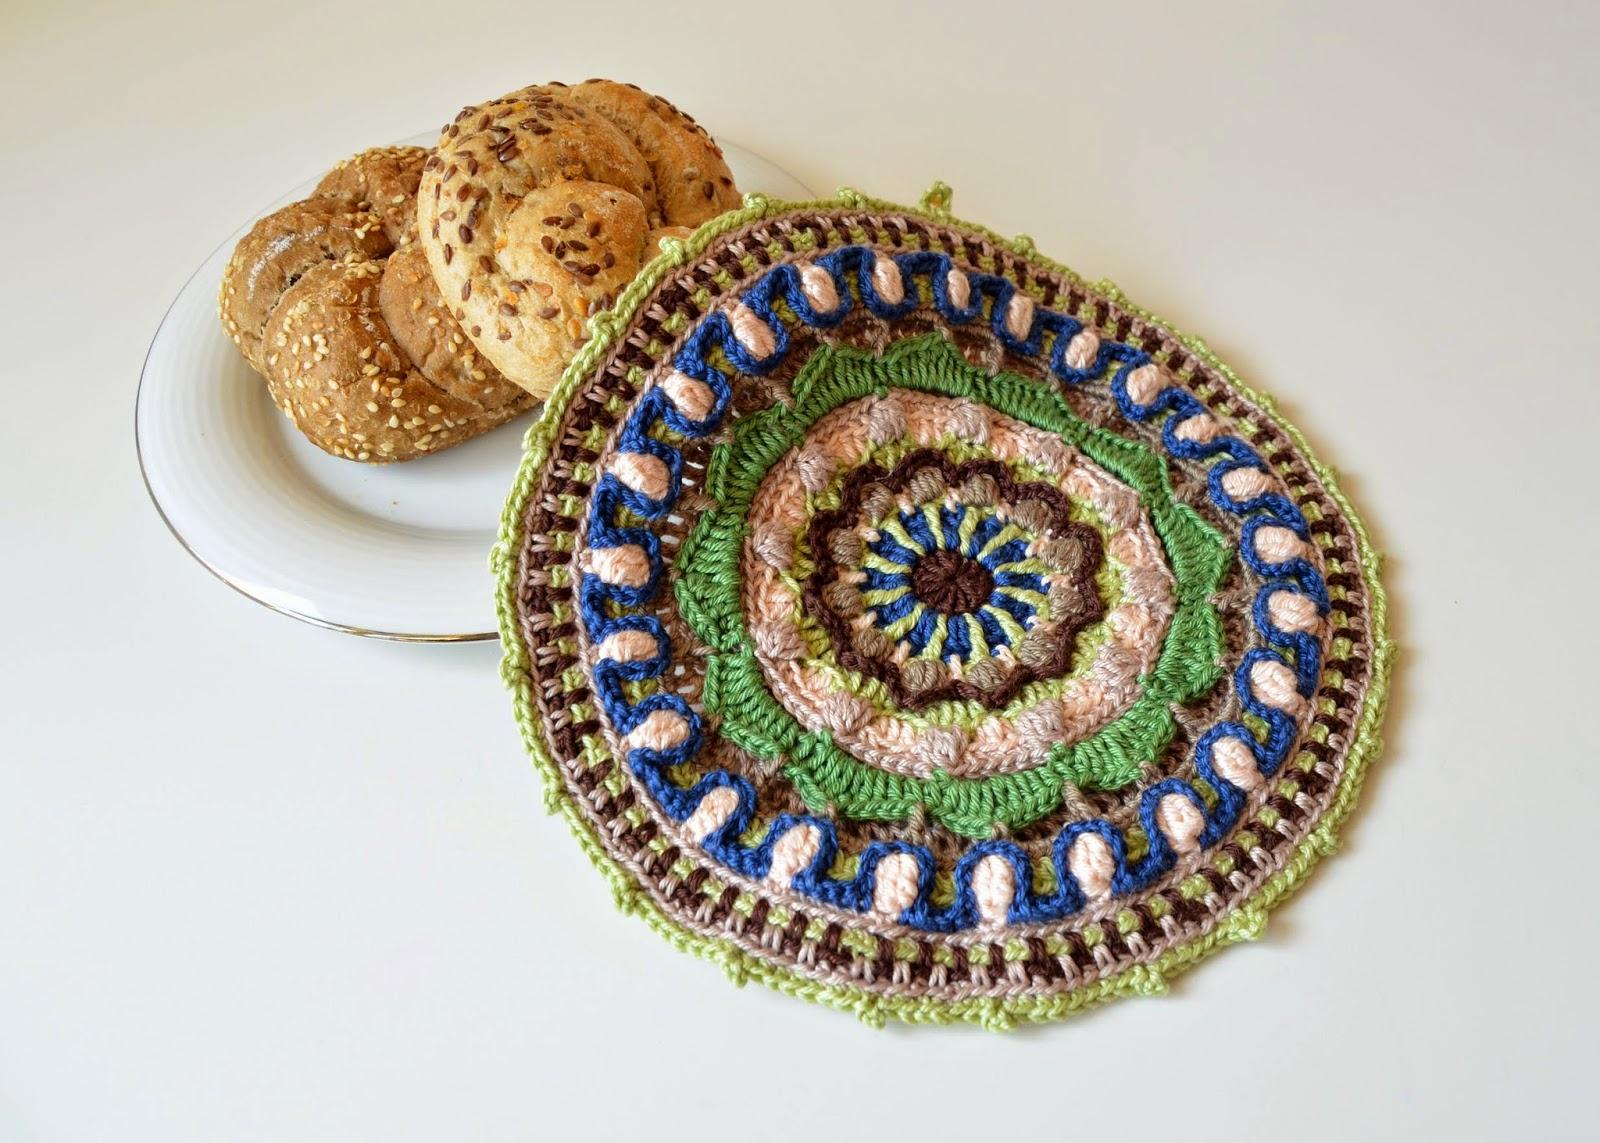 Crochet For Meditation: Colouring Mandala With Yarn